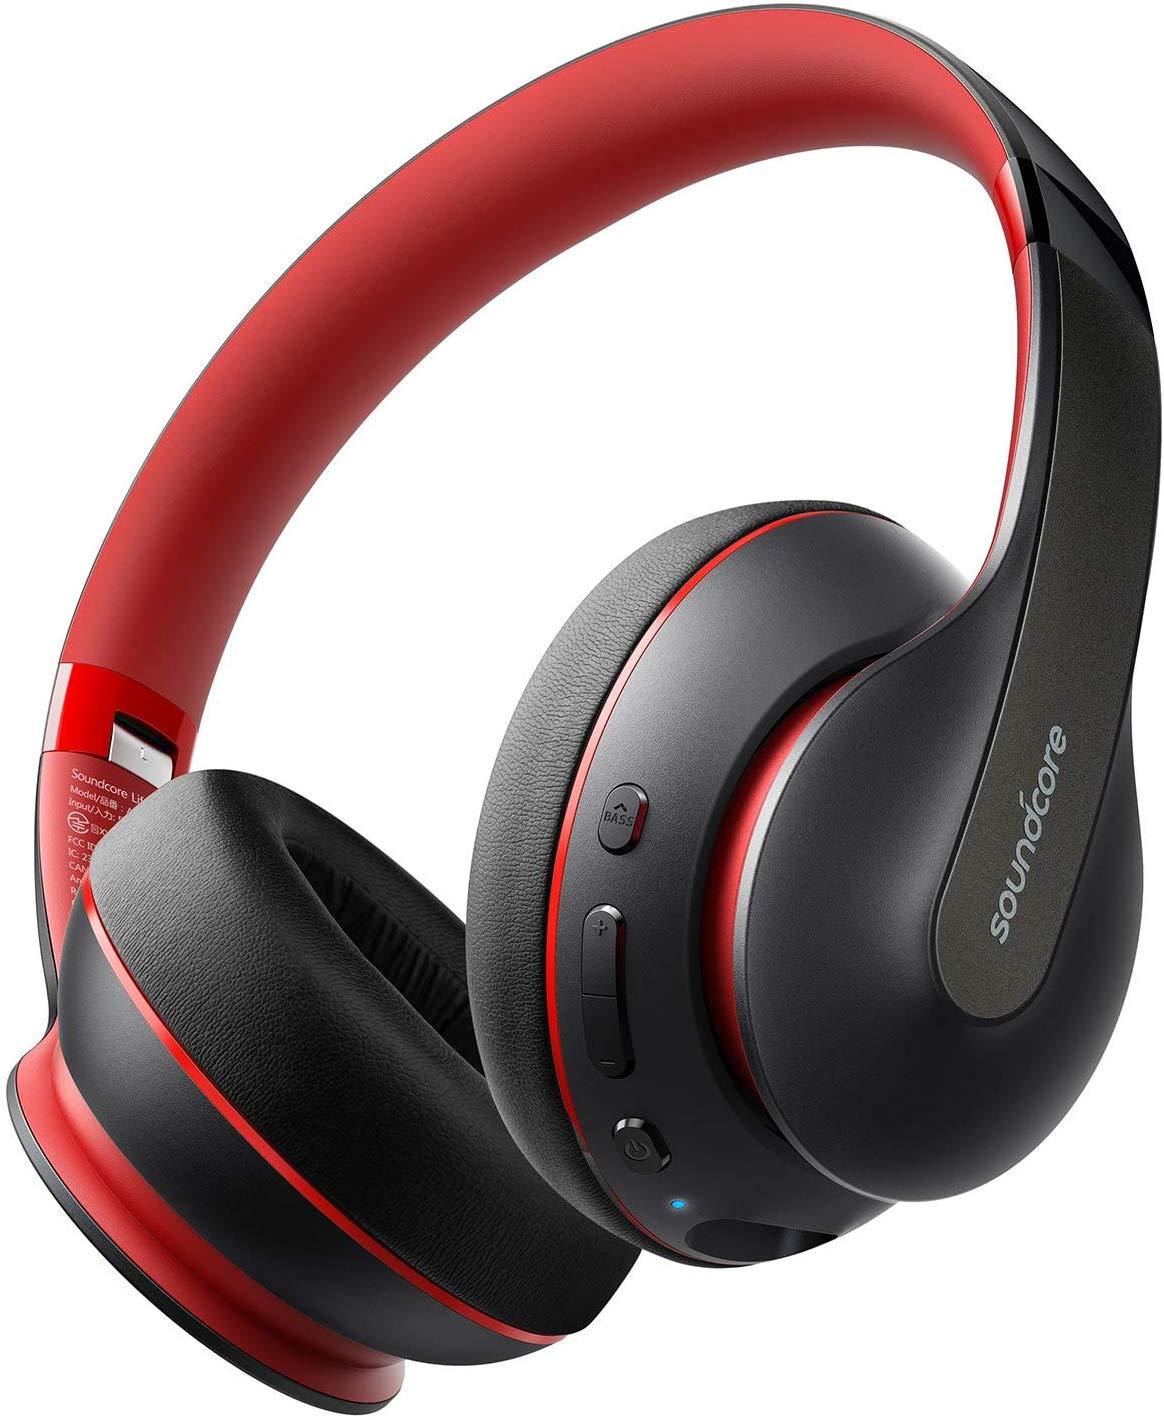 Anker Soundcore Life Q10 Wireless Bluetooth Headphone voor €29,99